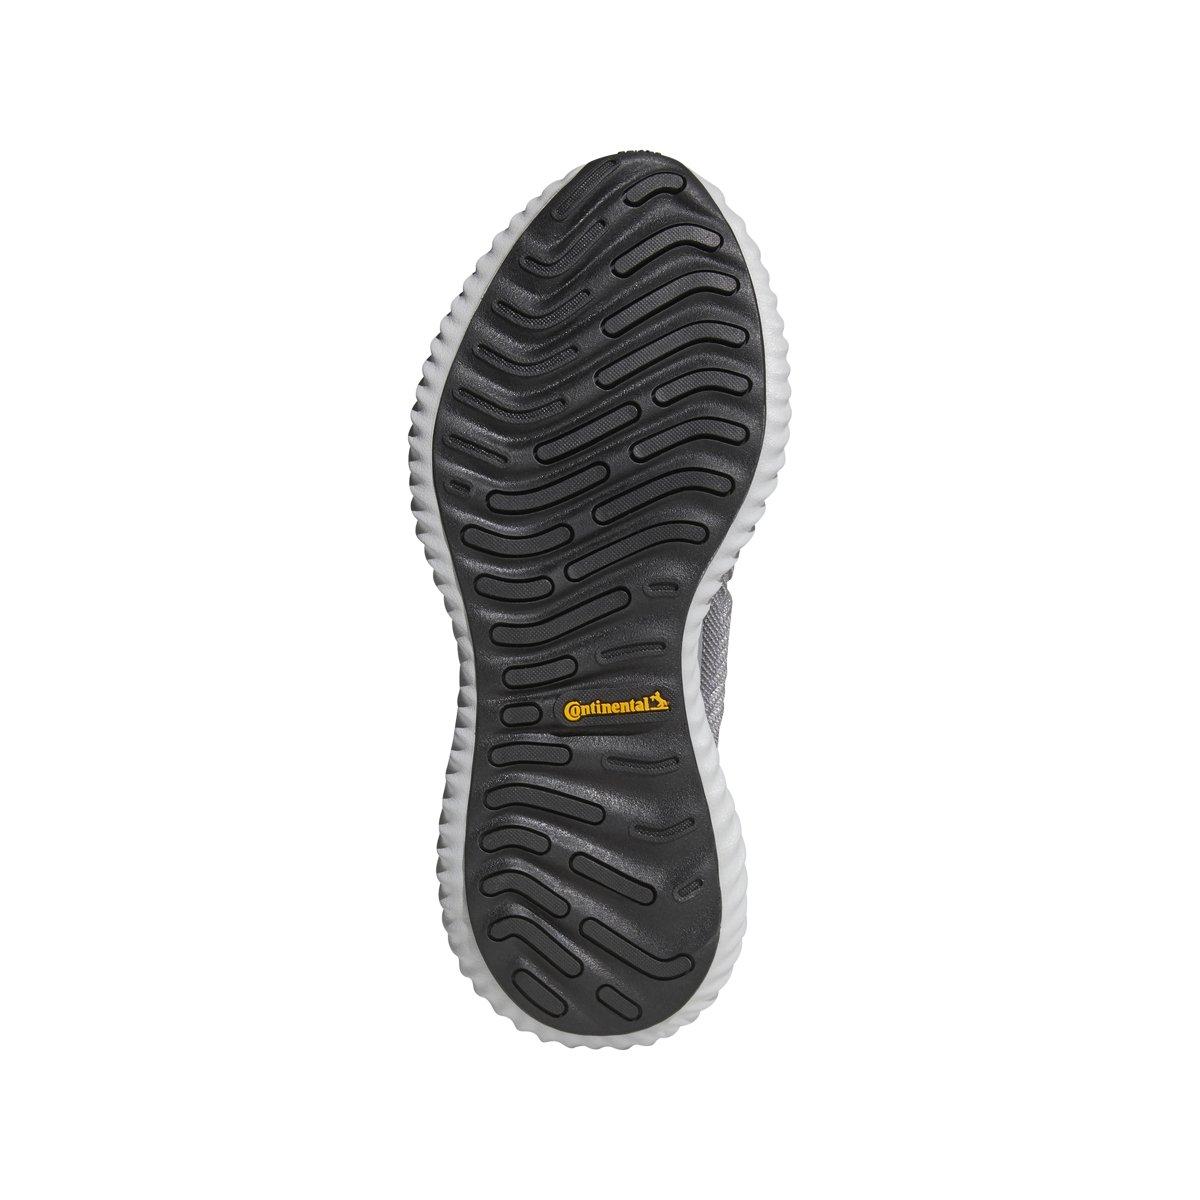 adidas Women's Alphabounce Beyond W Running Shoe B07BHKQJTP 11 B(M) US|Grey Two-grey Three-grey One